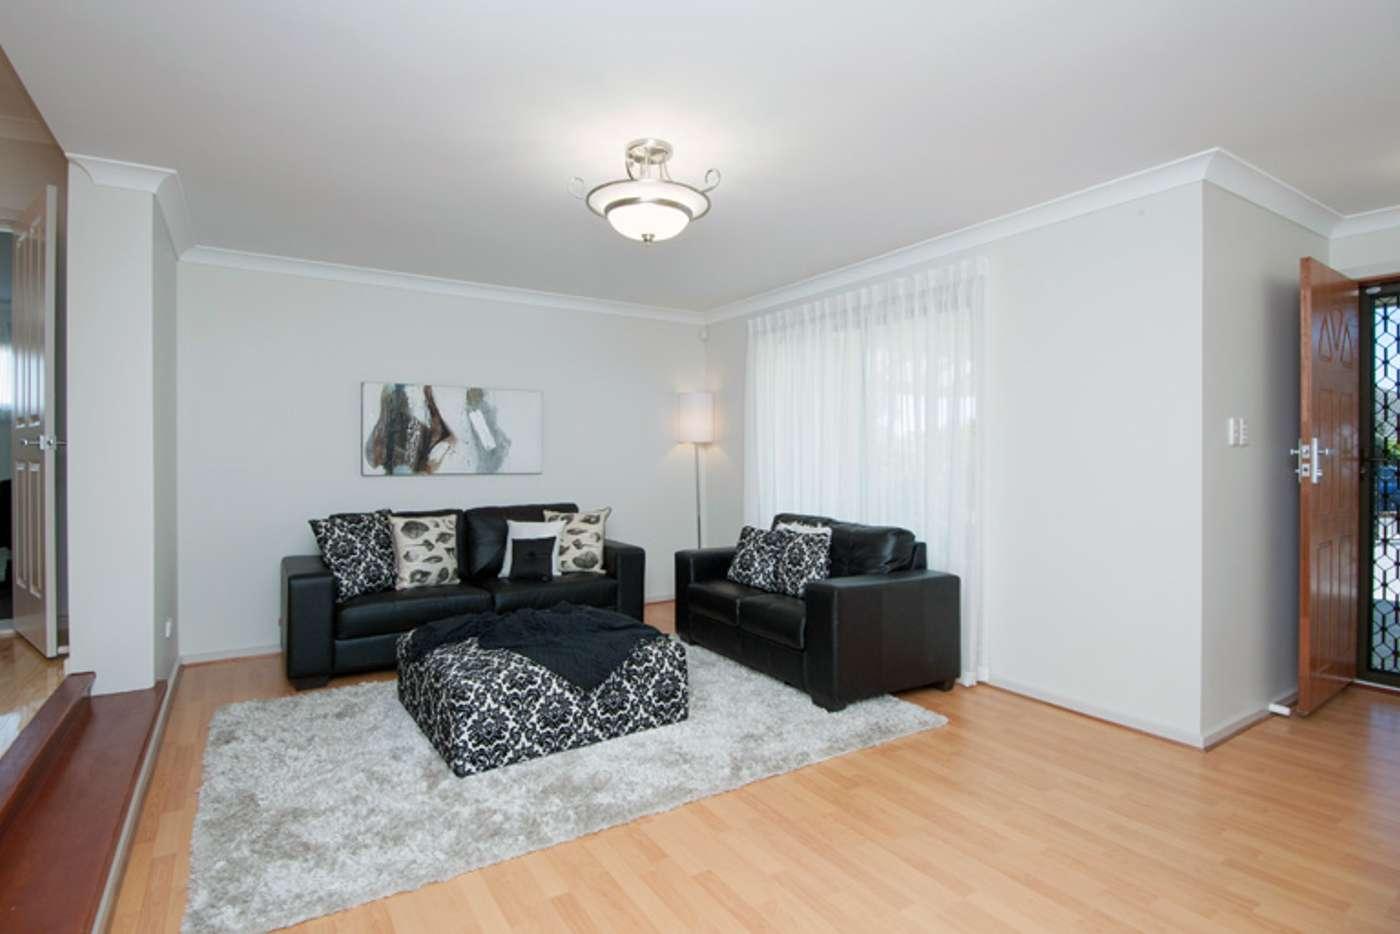 Sixth view of Homely house listing, 15 Kanangra Road, Seaview Downs SA 5049